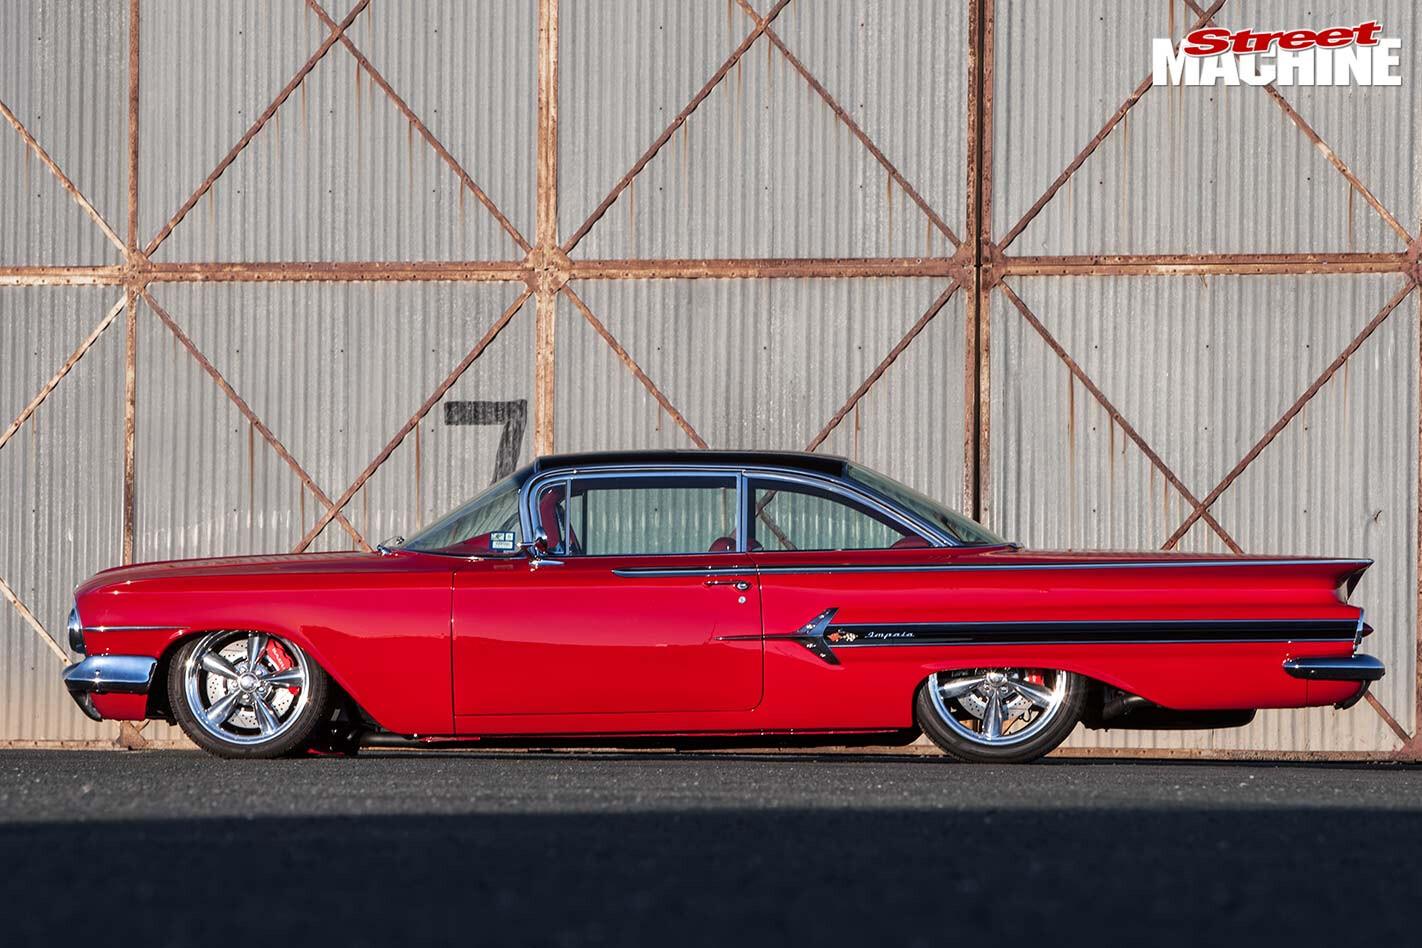 Chev Impala side